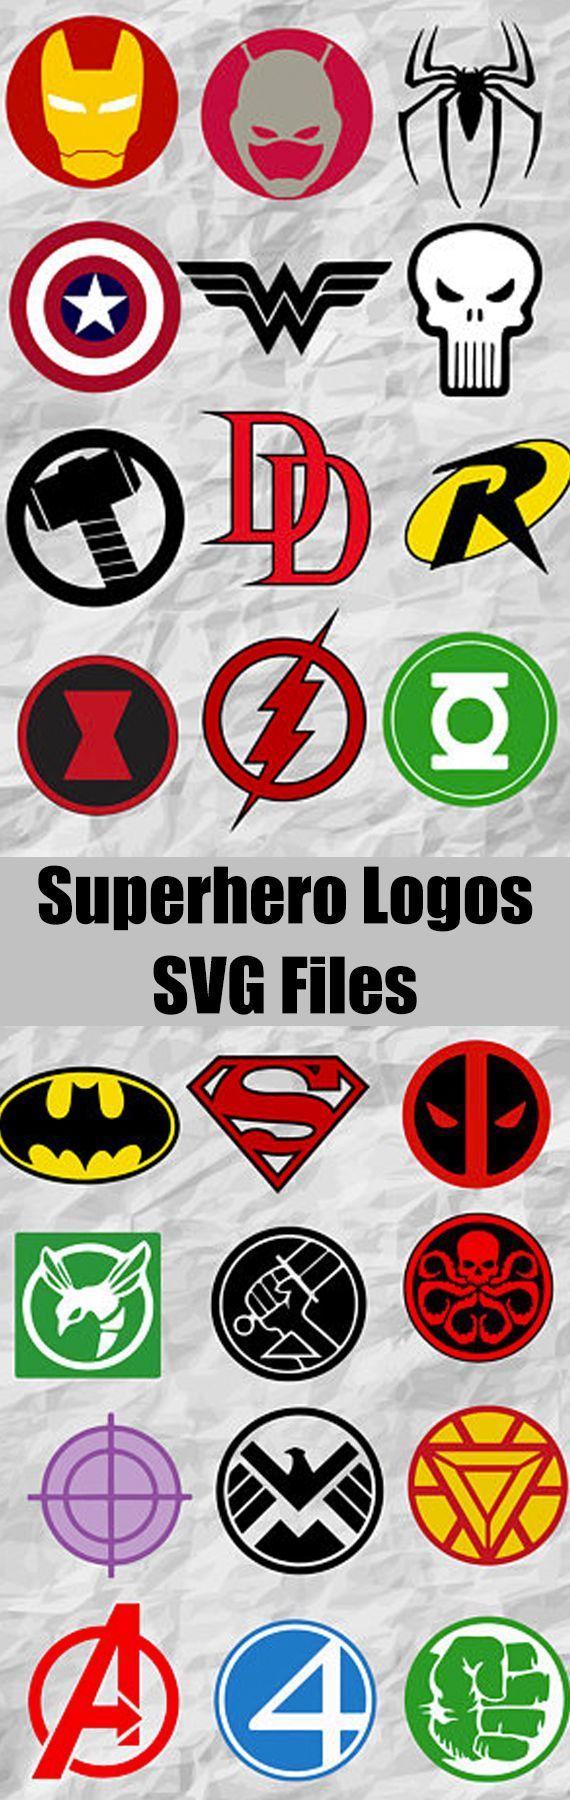 24 logo clipart clipart royalty free stock CLIP ART GALORE ~ 24 Superheroes Logo ClipArt | Cricut | Superhero ... clipart royalty free stock